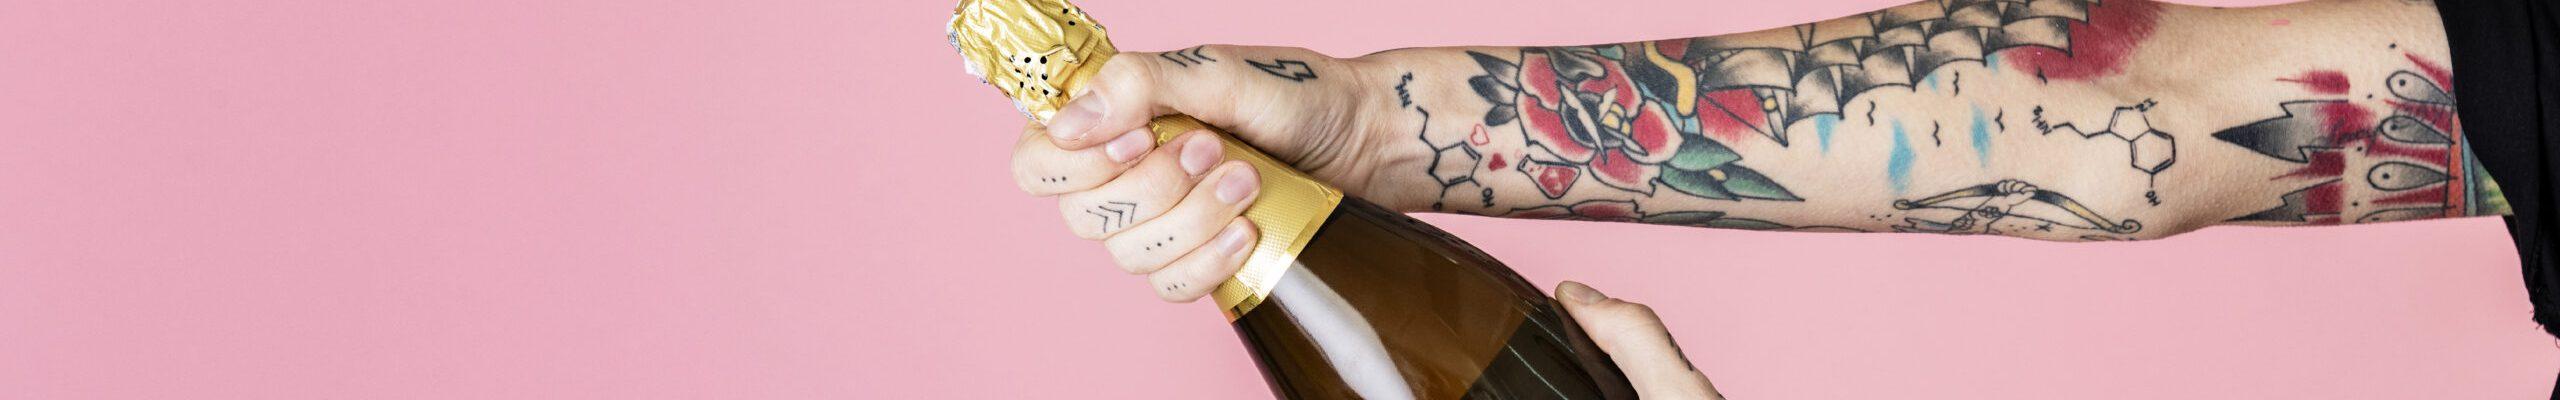 Tattooed feminine hand holding a bottle of champagne